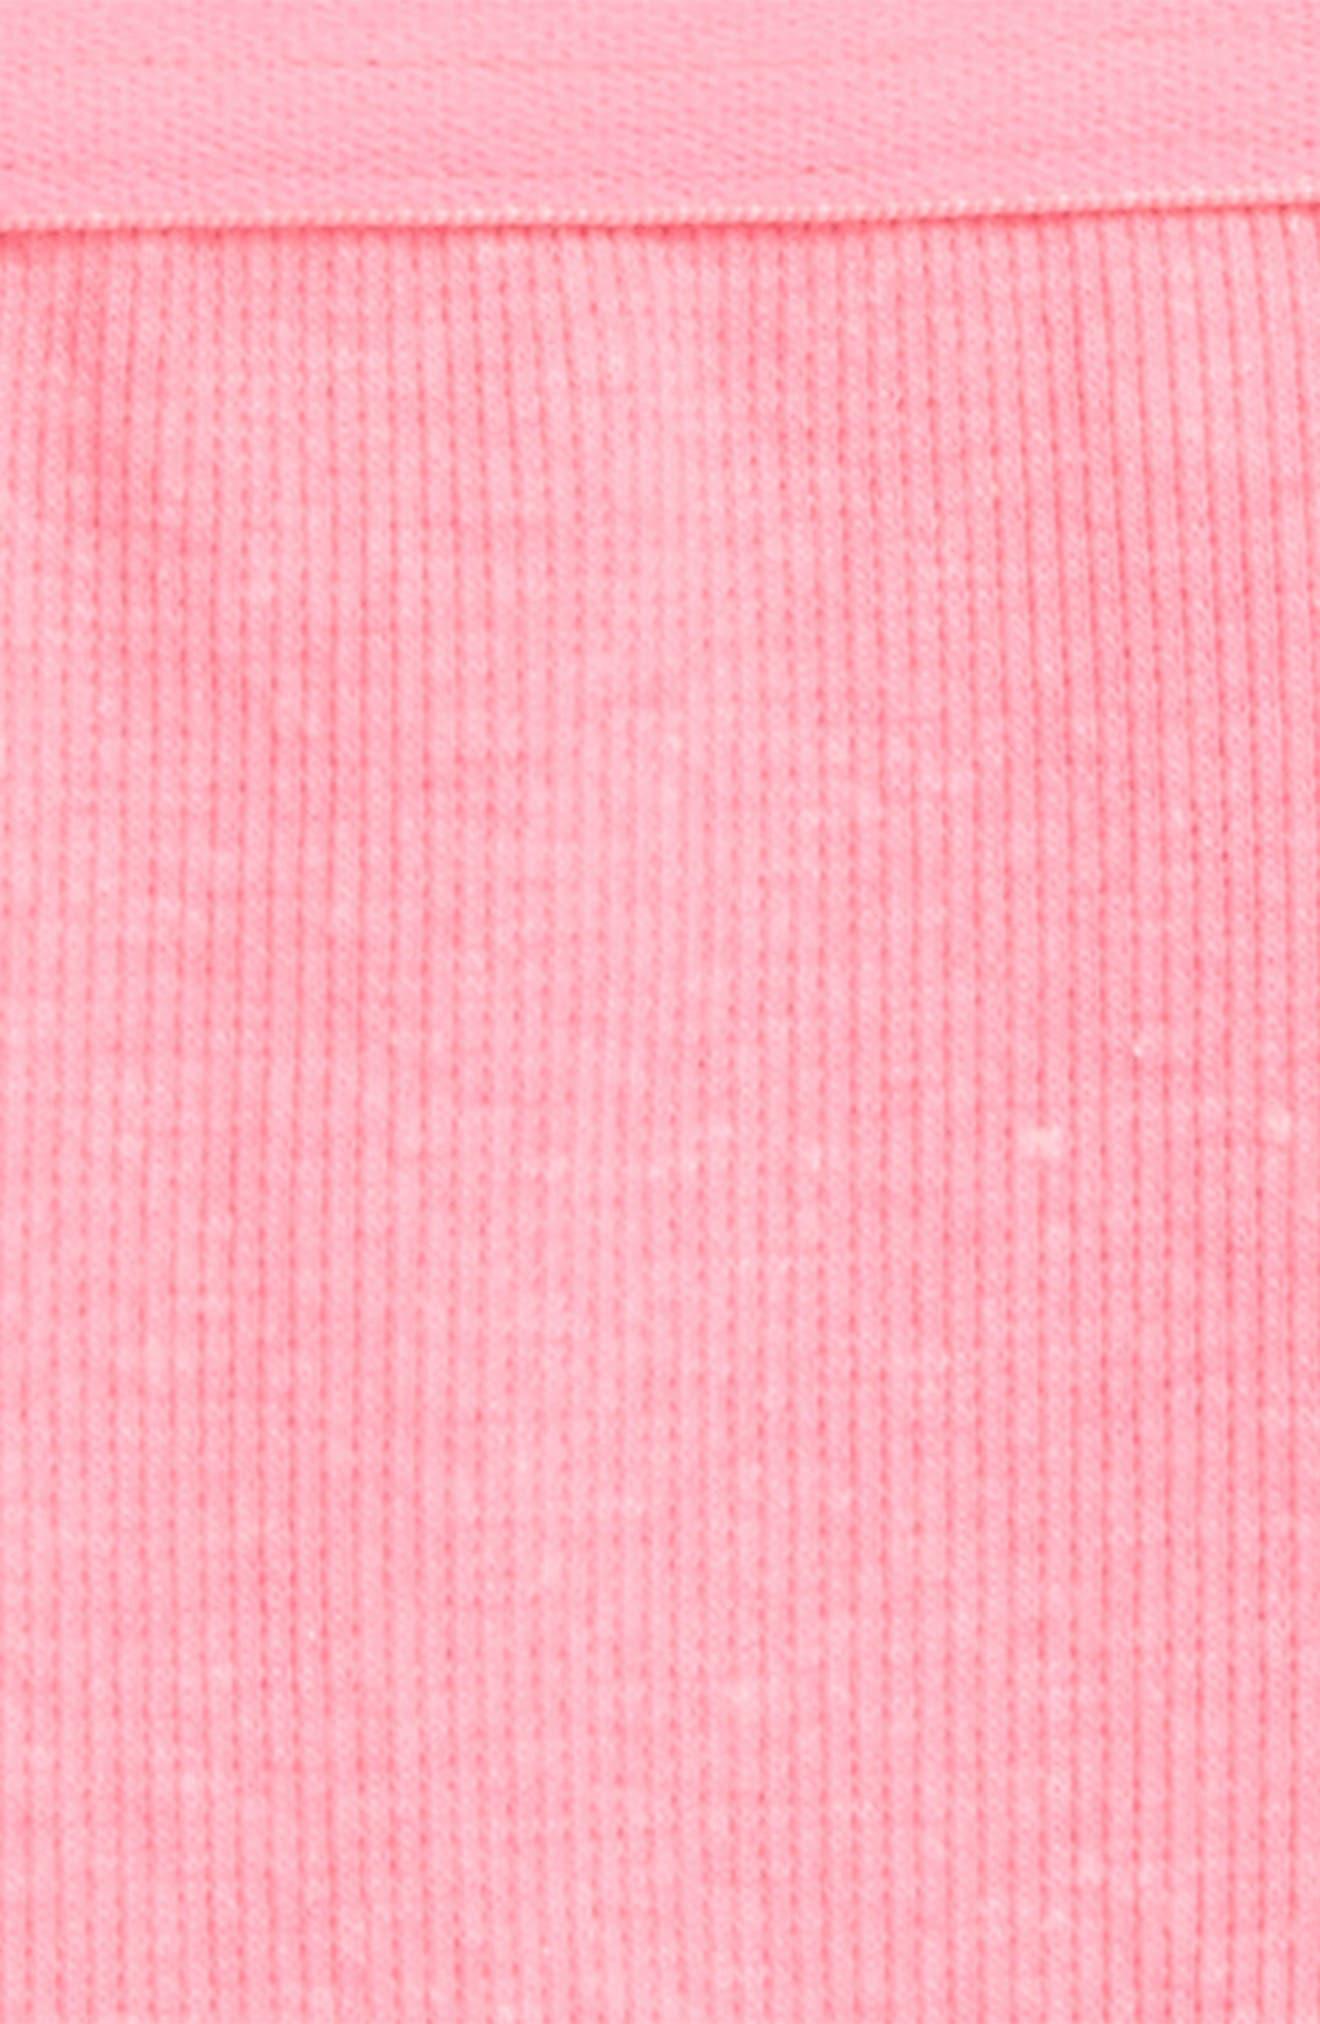 2-Pack Ribbed Leggings,                             Alternate thumbnail 2, color,                             Pink